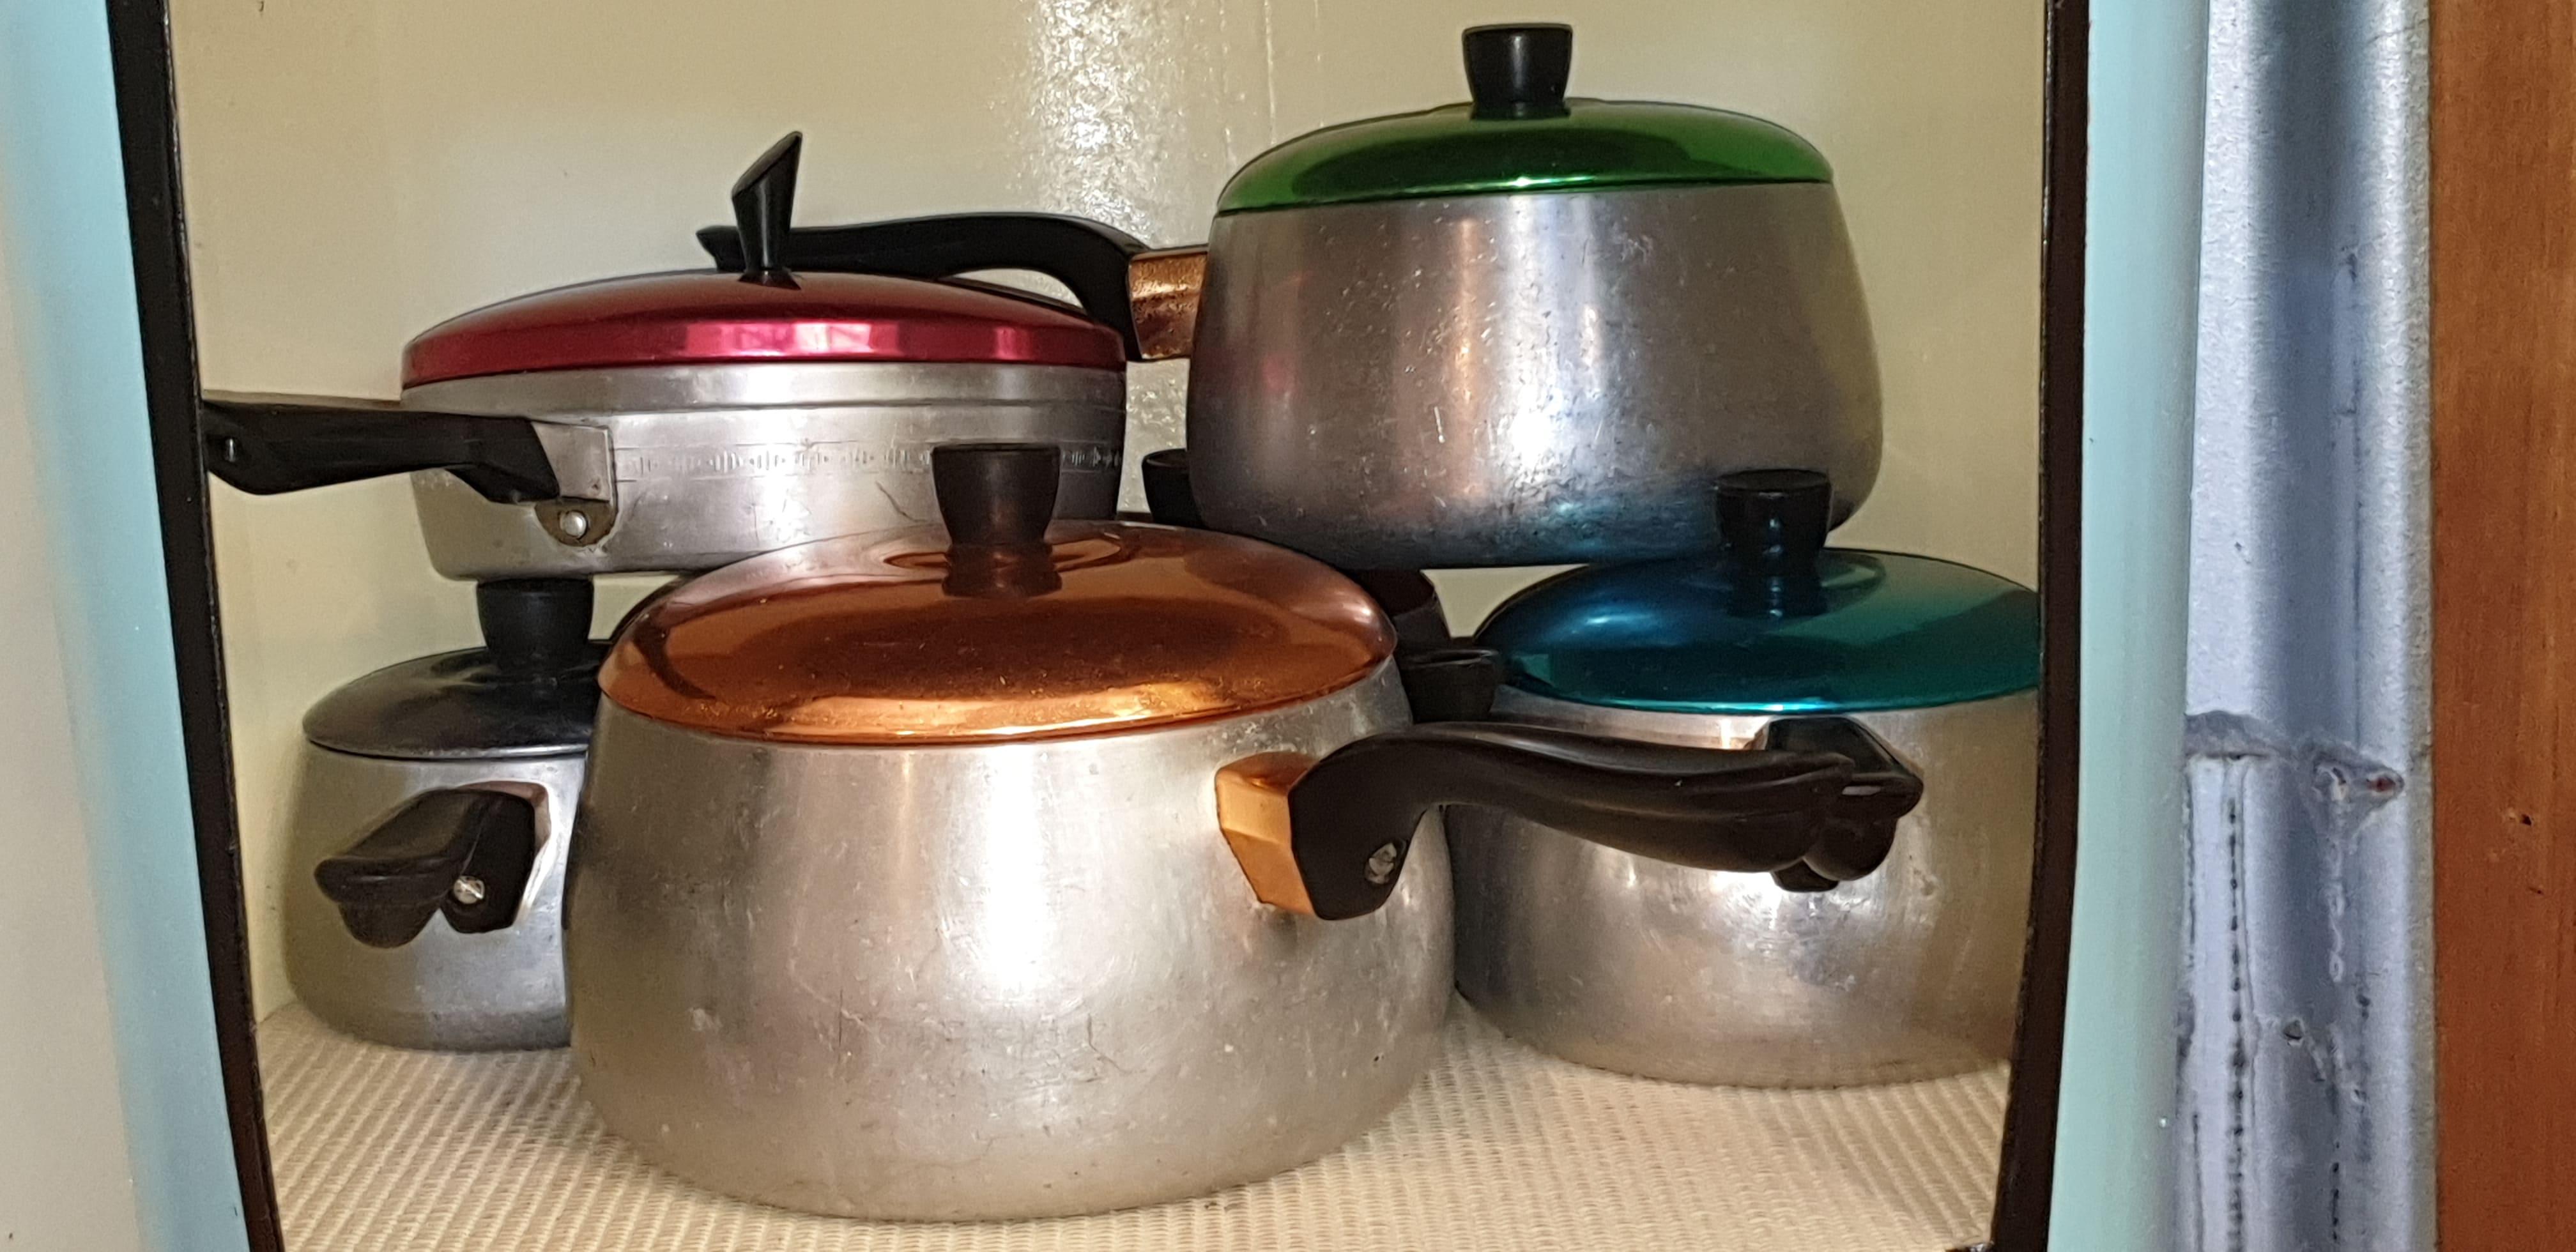 Retro cooking pots including egg poacher. gallery image